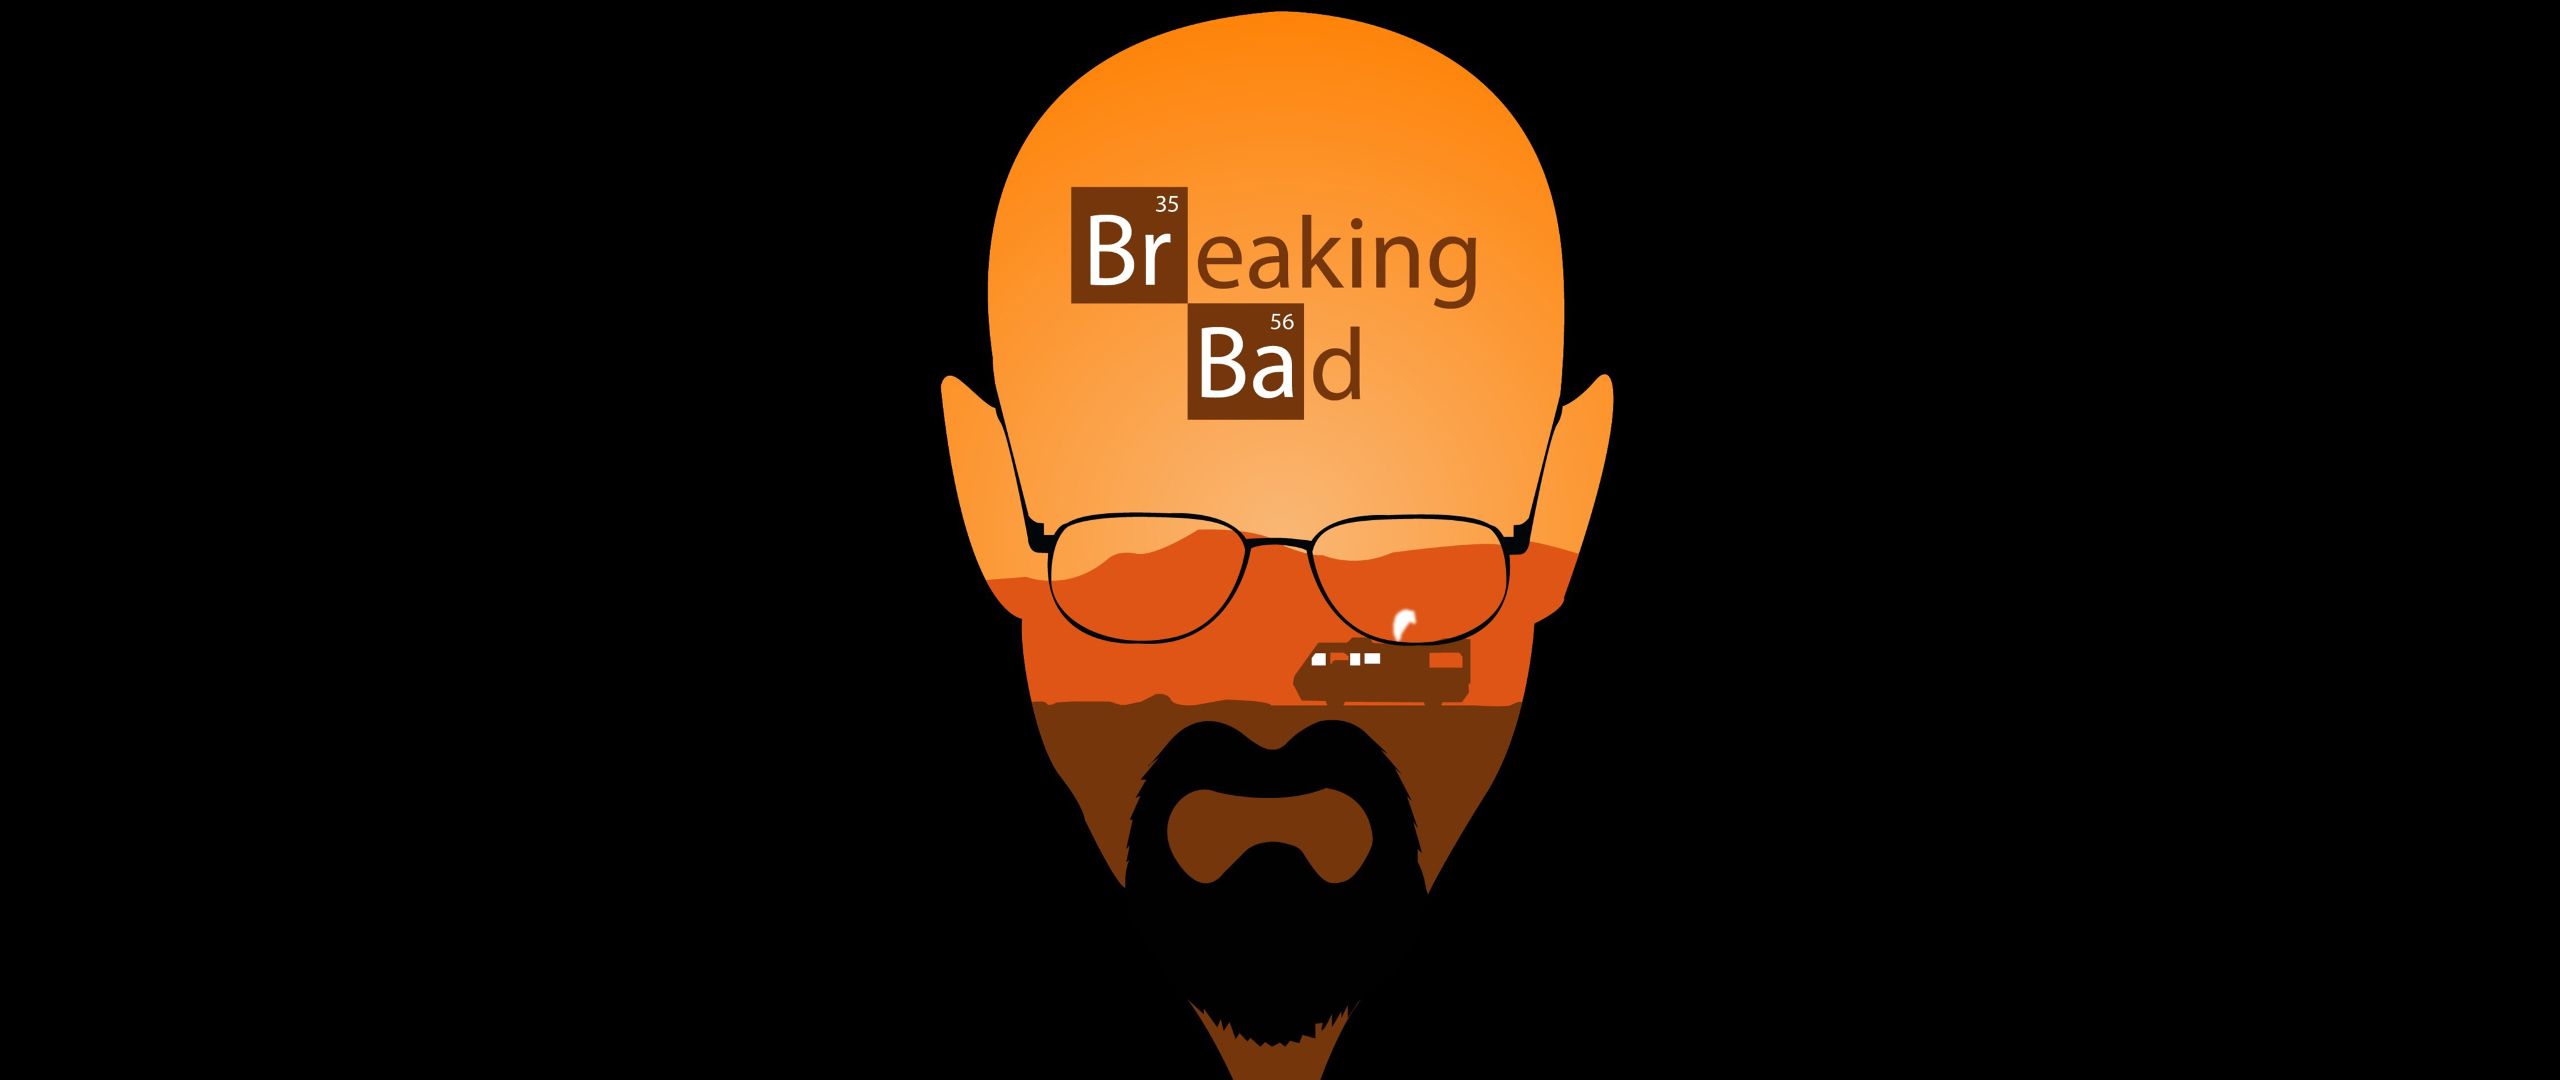 2560x1080 Breaking Bad Minimal Artwork 2560x1080 Resolution